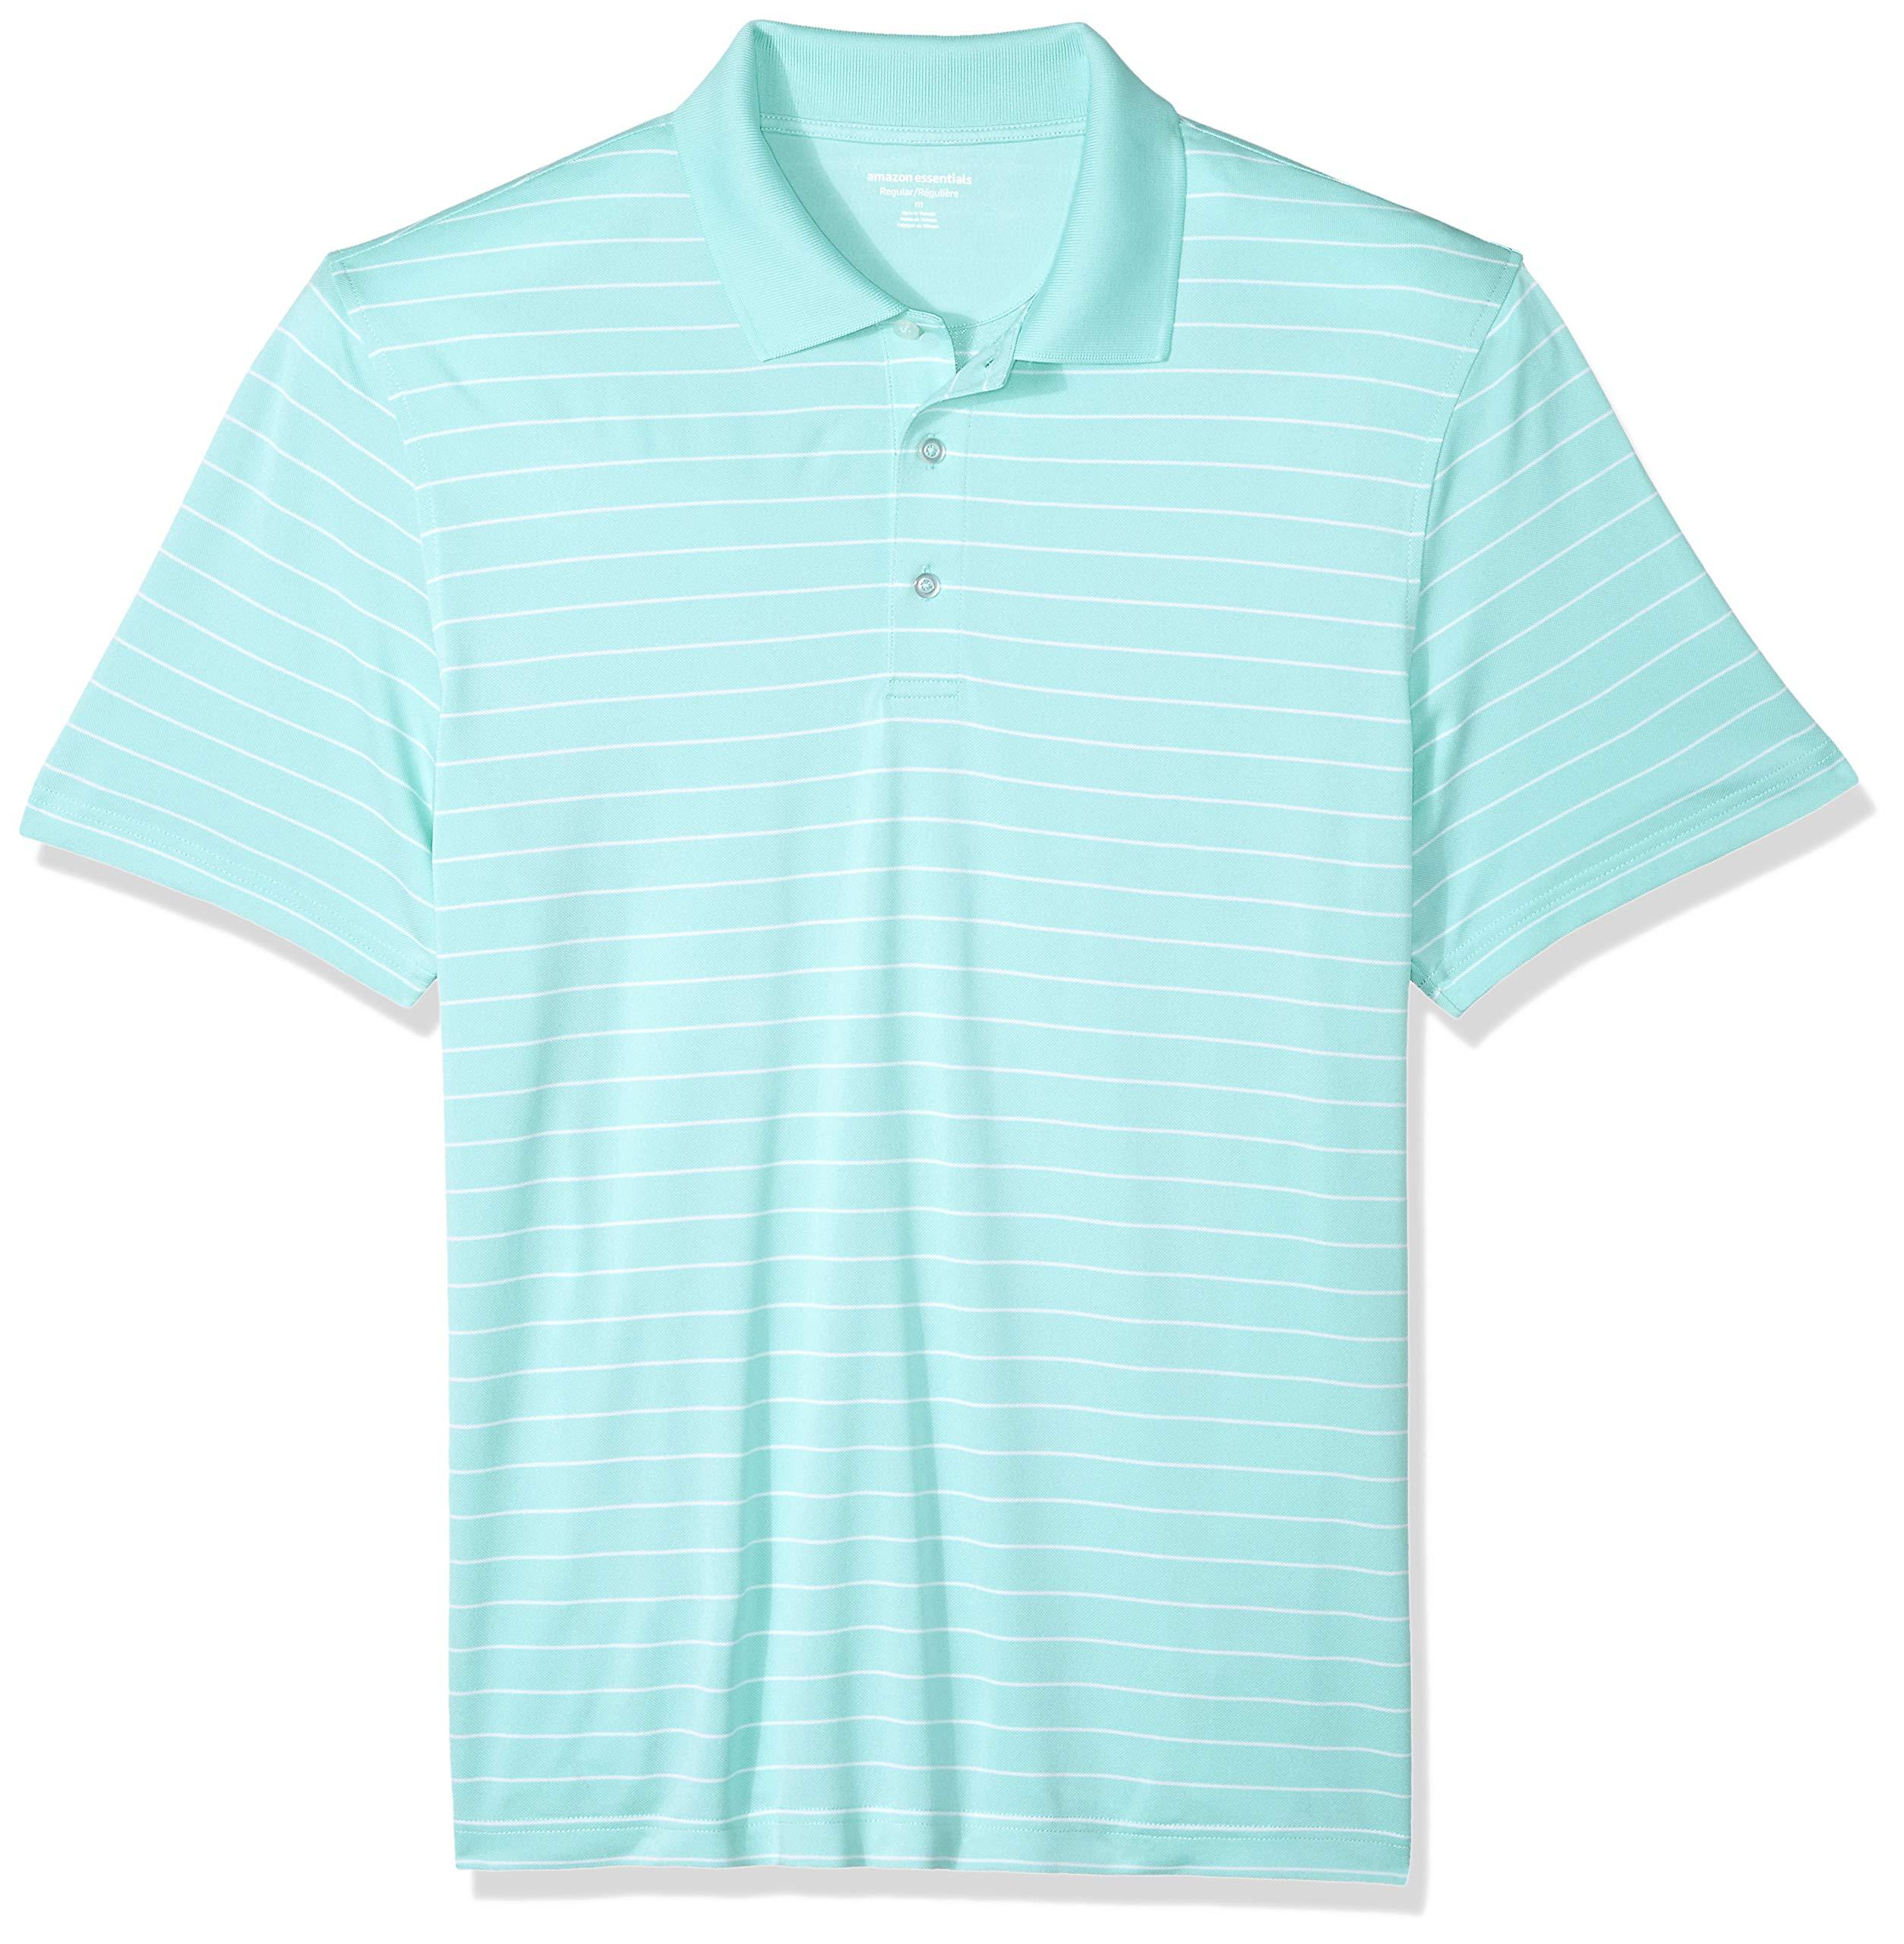 Amazon Essentials Men's Regular-Fit Quick-Dry Golf Polo Shirt, Aqua Stripe, X-Small